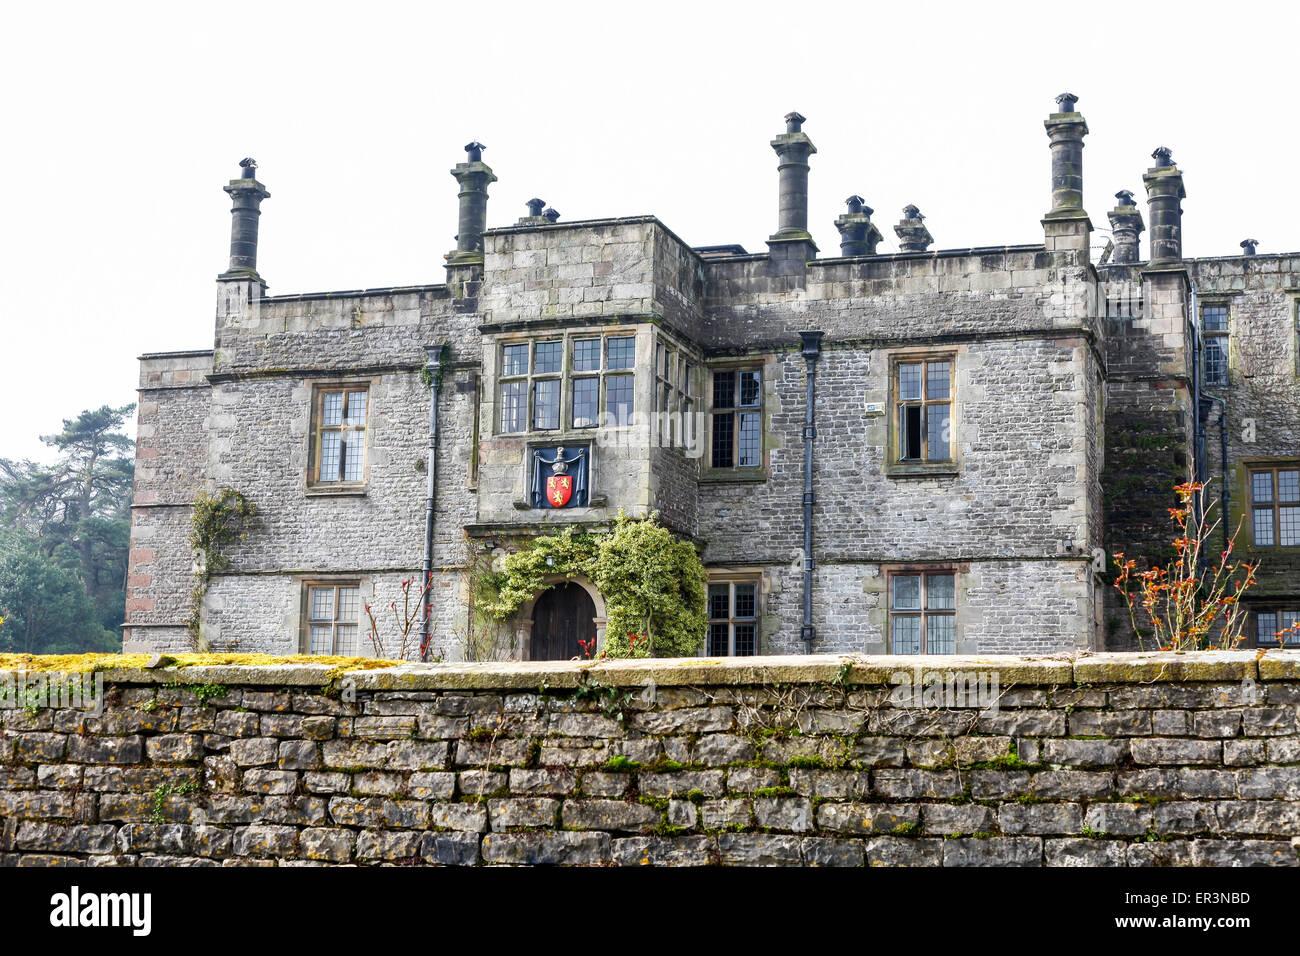 Tissington Hall is an early 17th-century Jacobean mansion house in Tissington, near Ashbourne, Derbyshire, England, Stock Photo